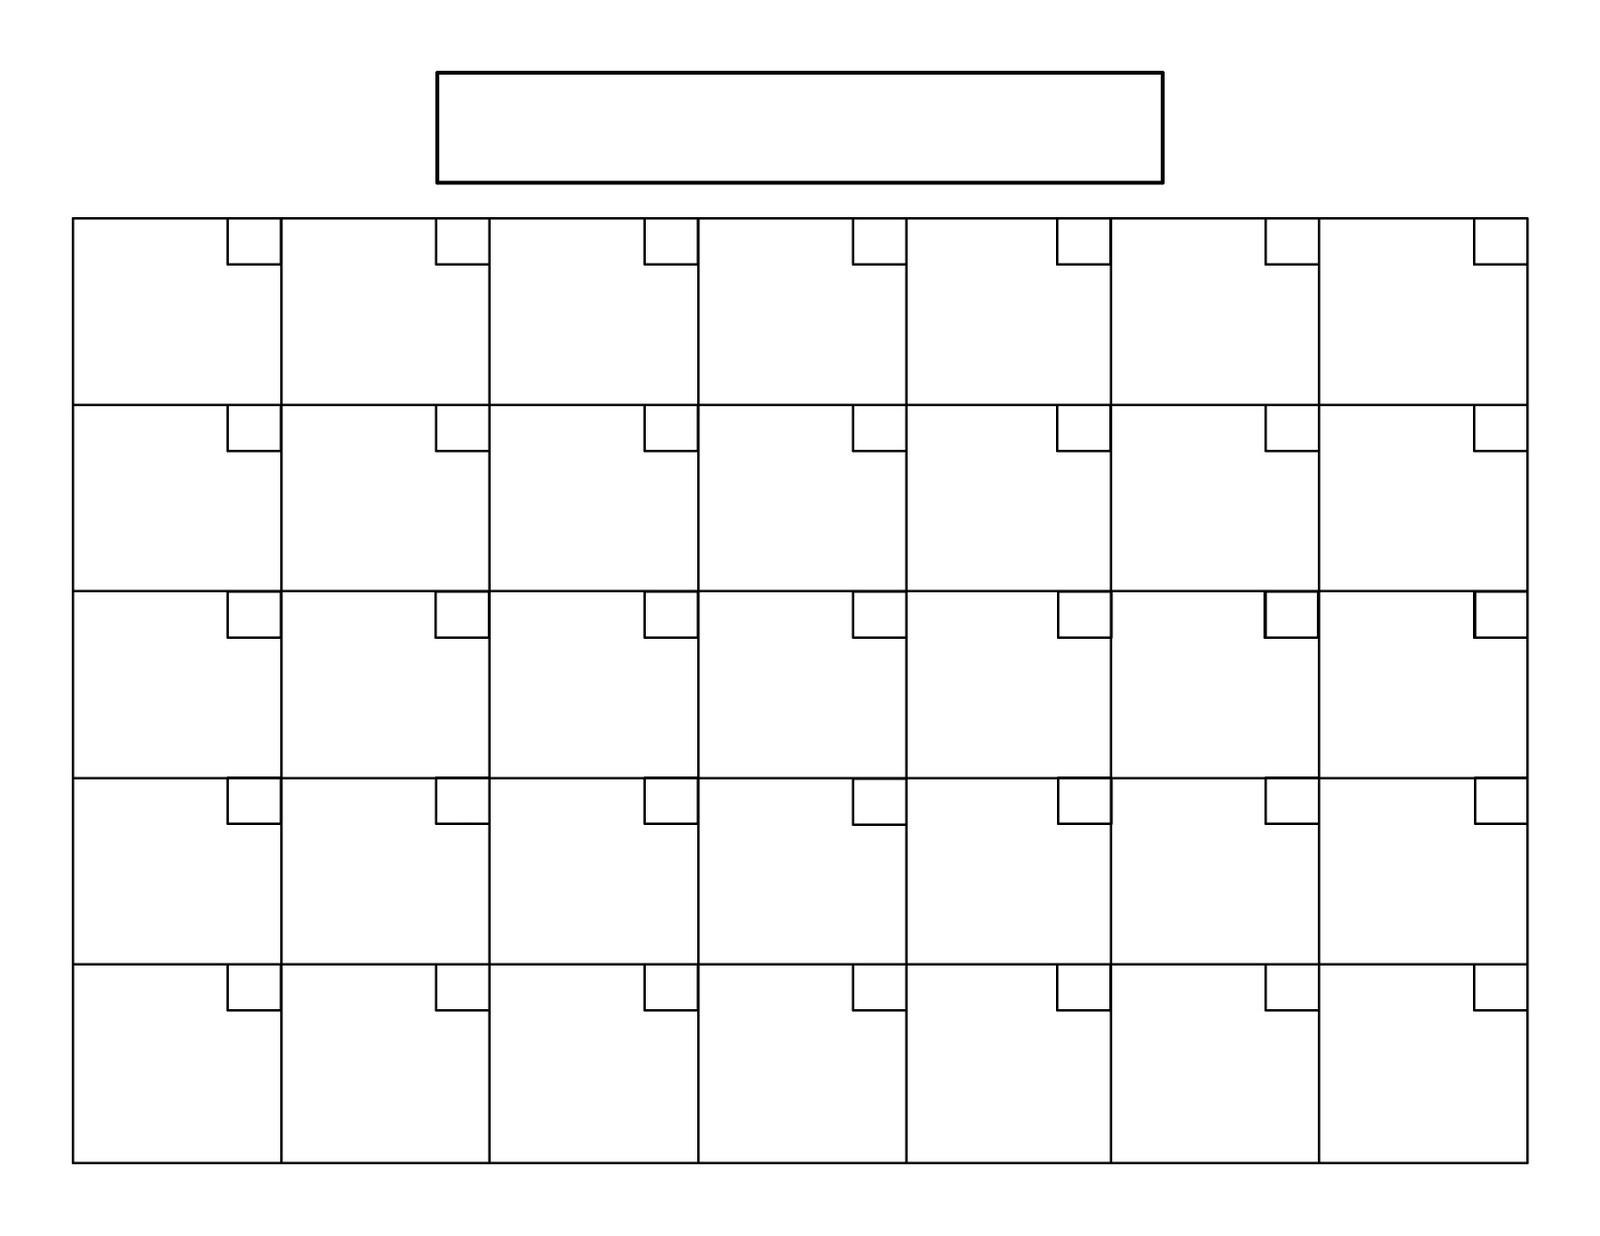 15 Calendar Grid Template Images - Blank Calendar Grid-Free Printable Blank Calendar Grid